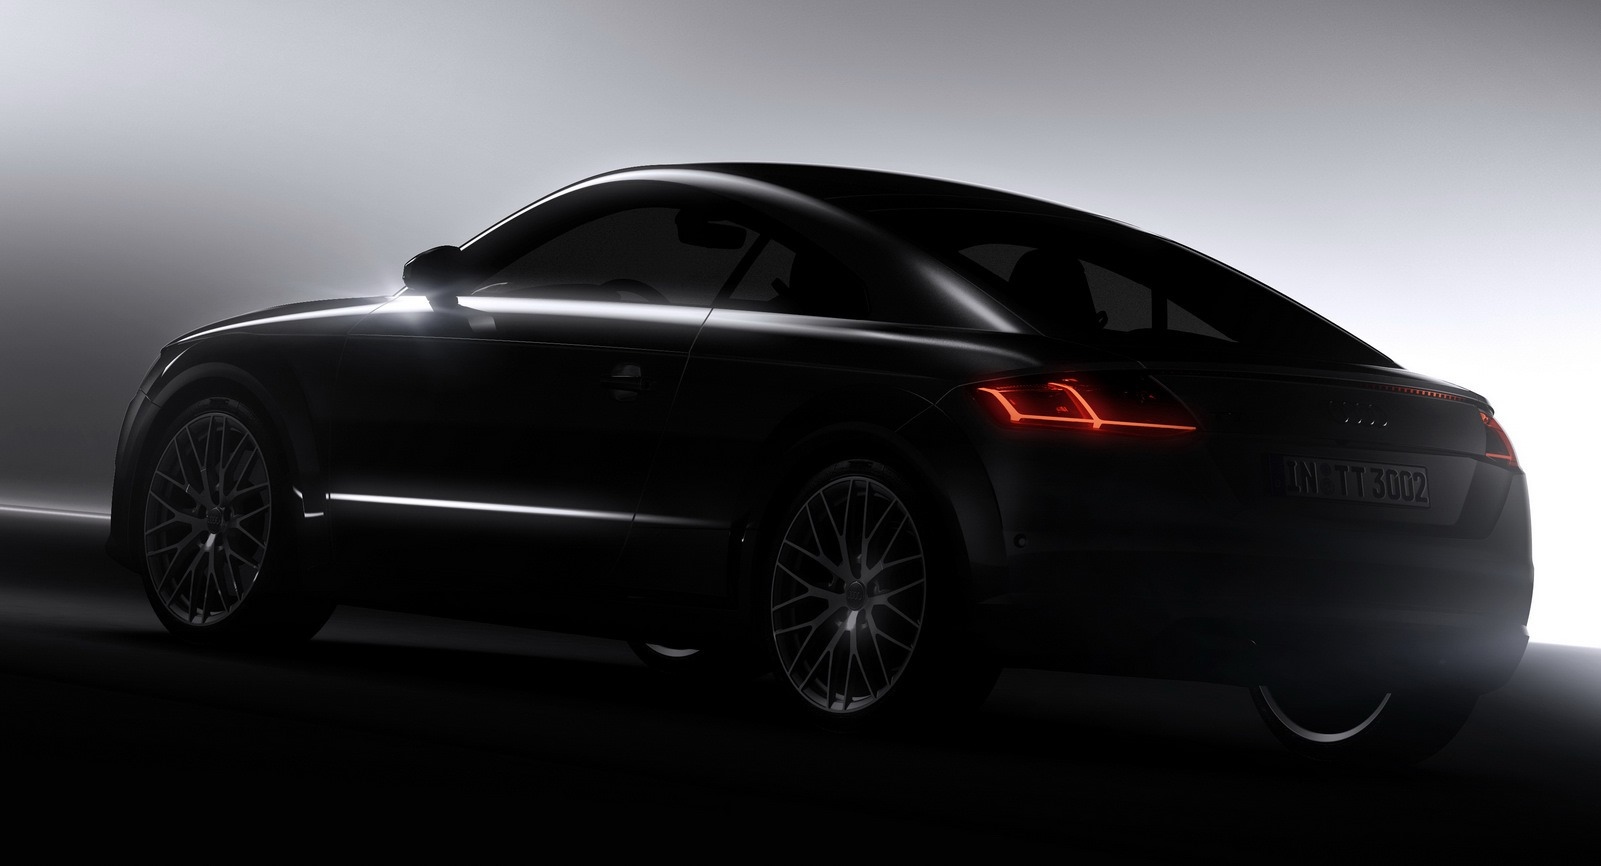 [Resim: Yeni-Audi-TT-2015-3.jpg]